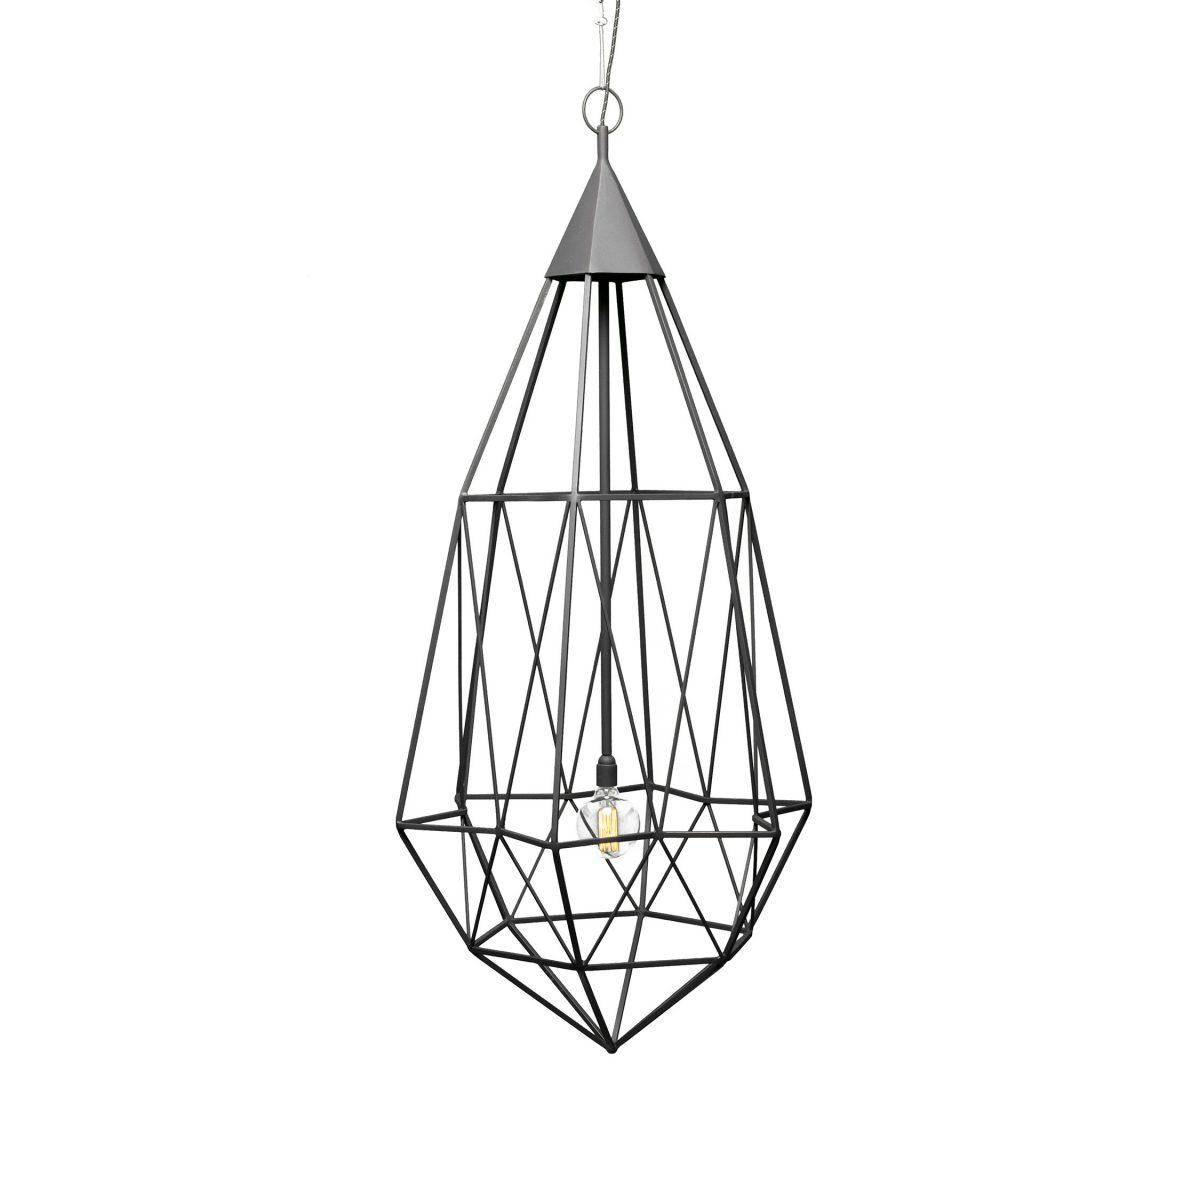 diamonds XXL large hanglamp pendant JSPR—Gimmii shop kroonluchter